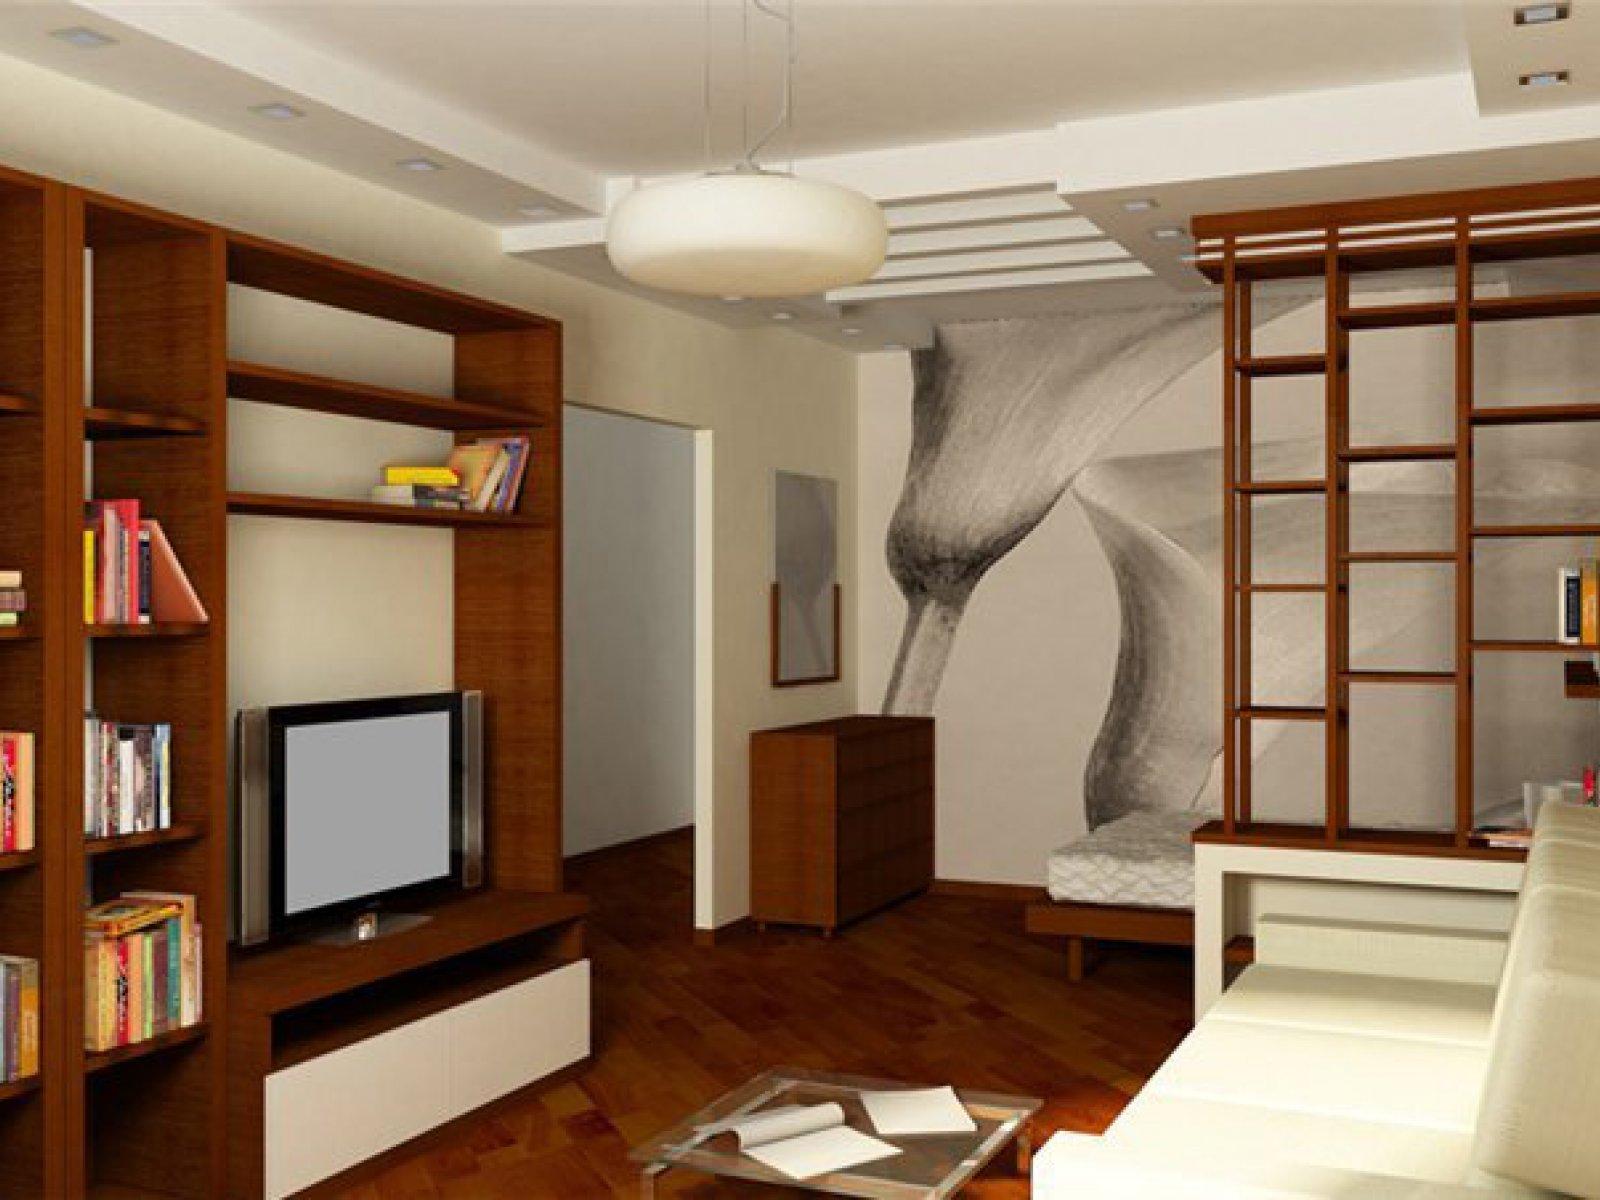 Дизайн интерьера маленькой двухкомнатной квартиры